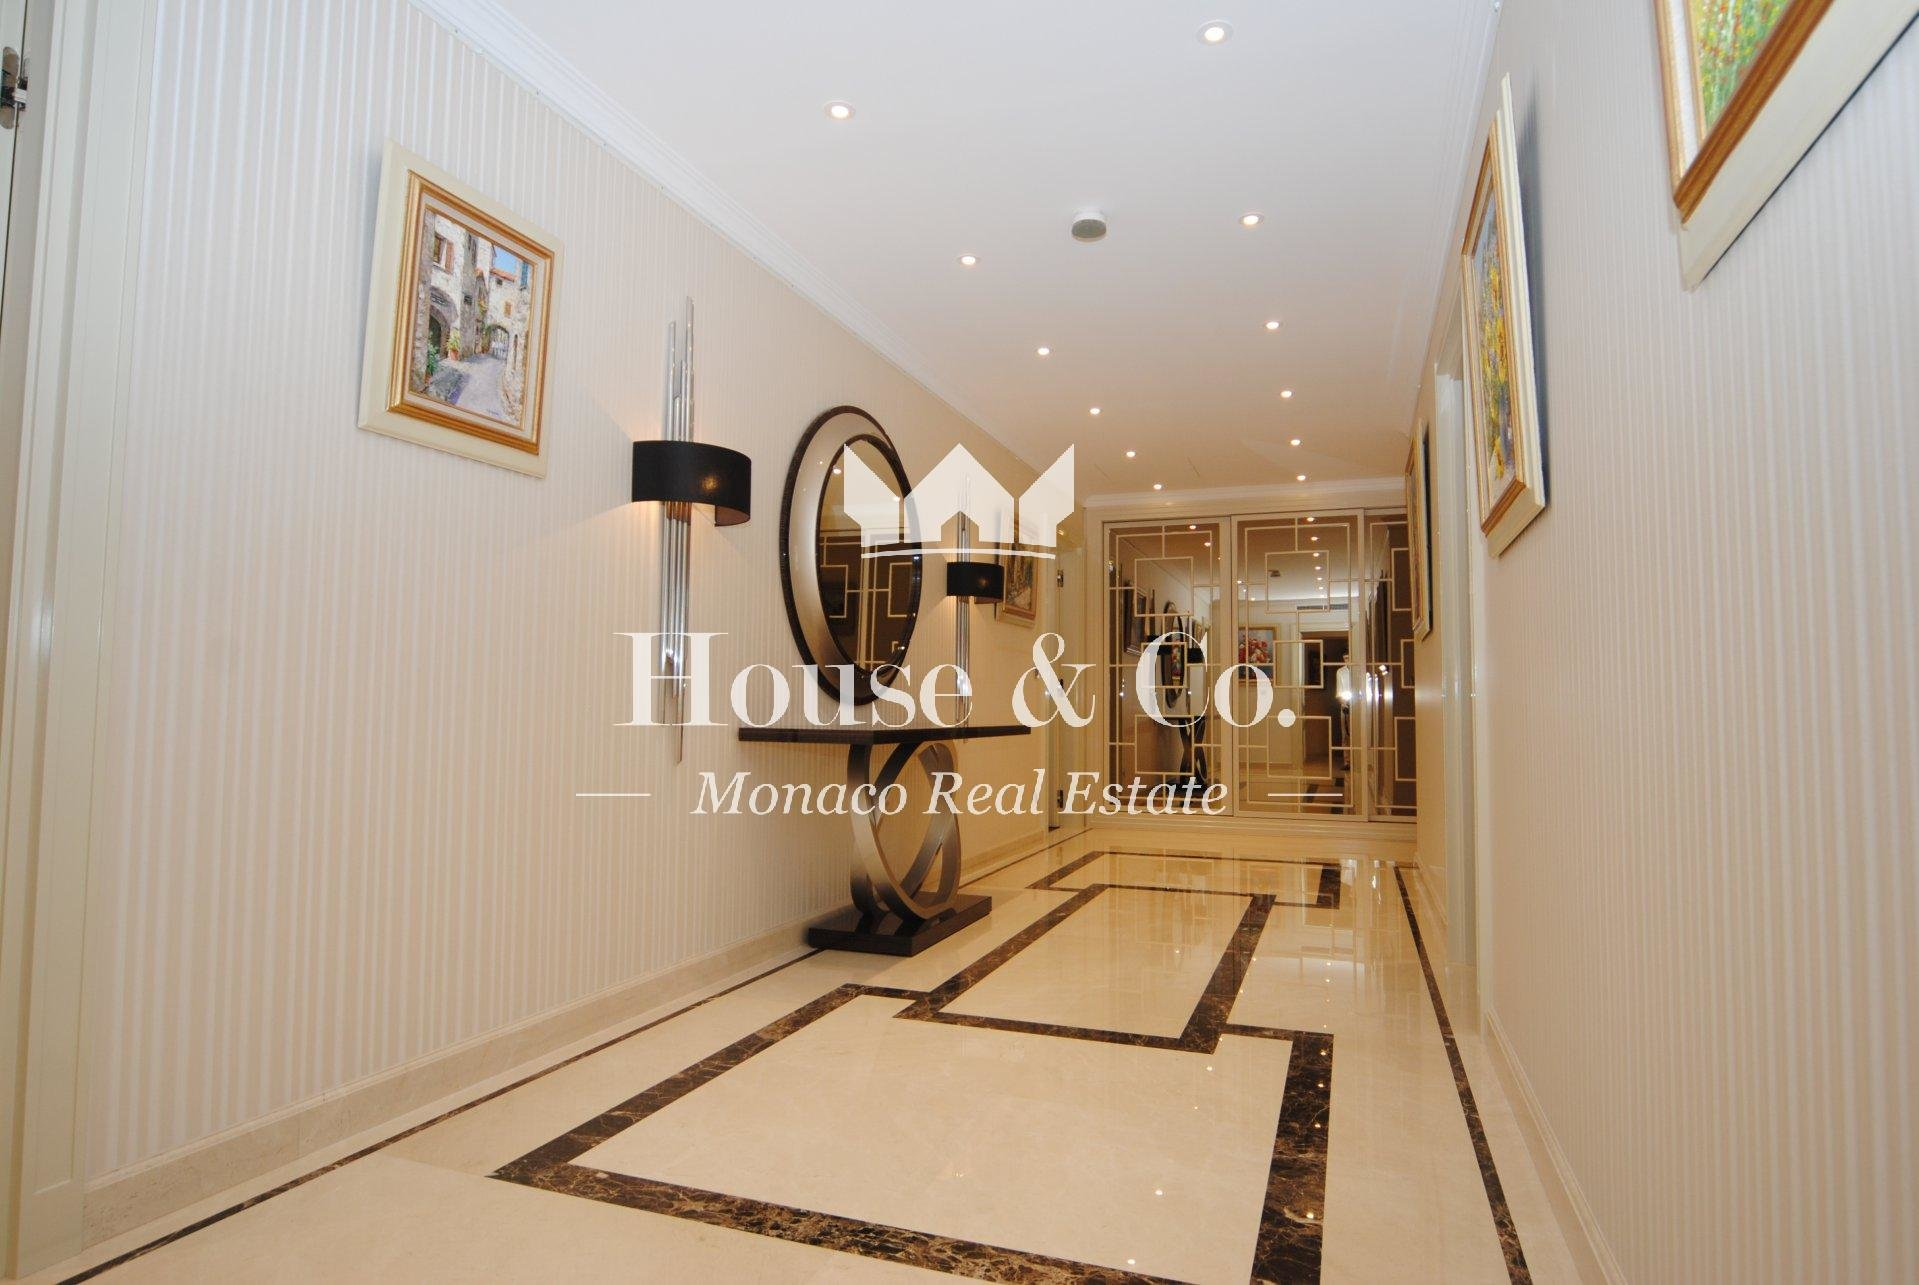 Exclusif and prestigious apartment on the Monaco port